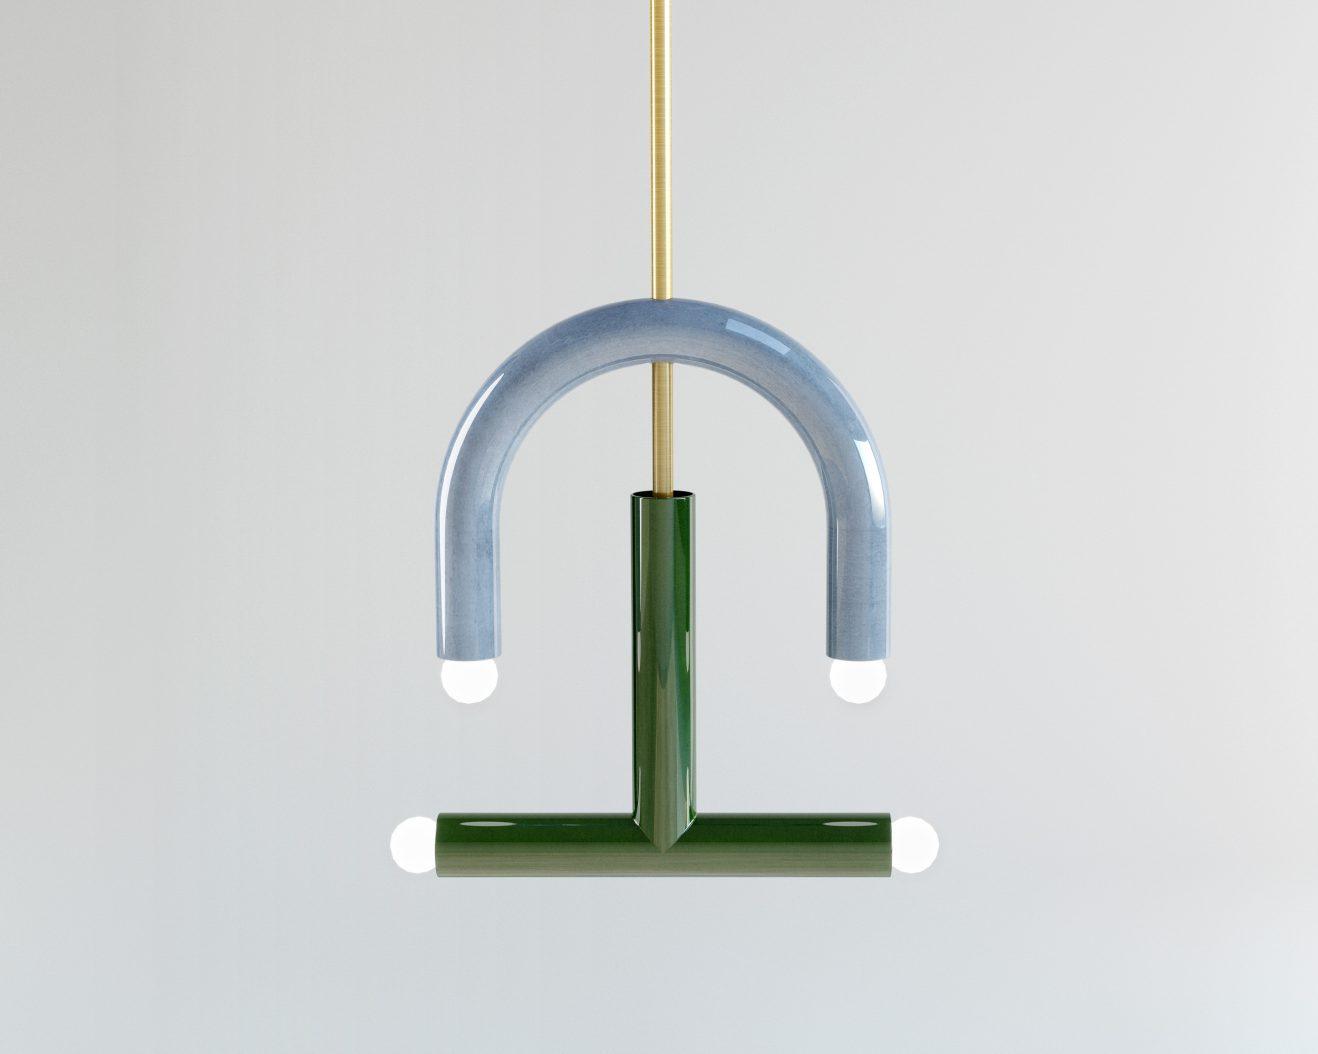 Pani-Jurek-Pendant-Lamp-C3